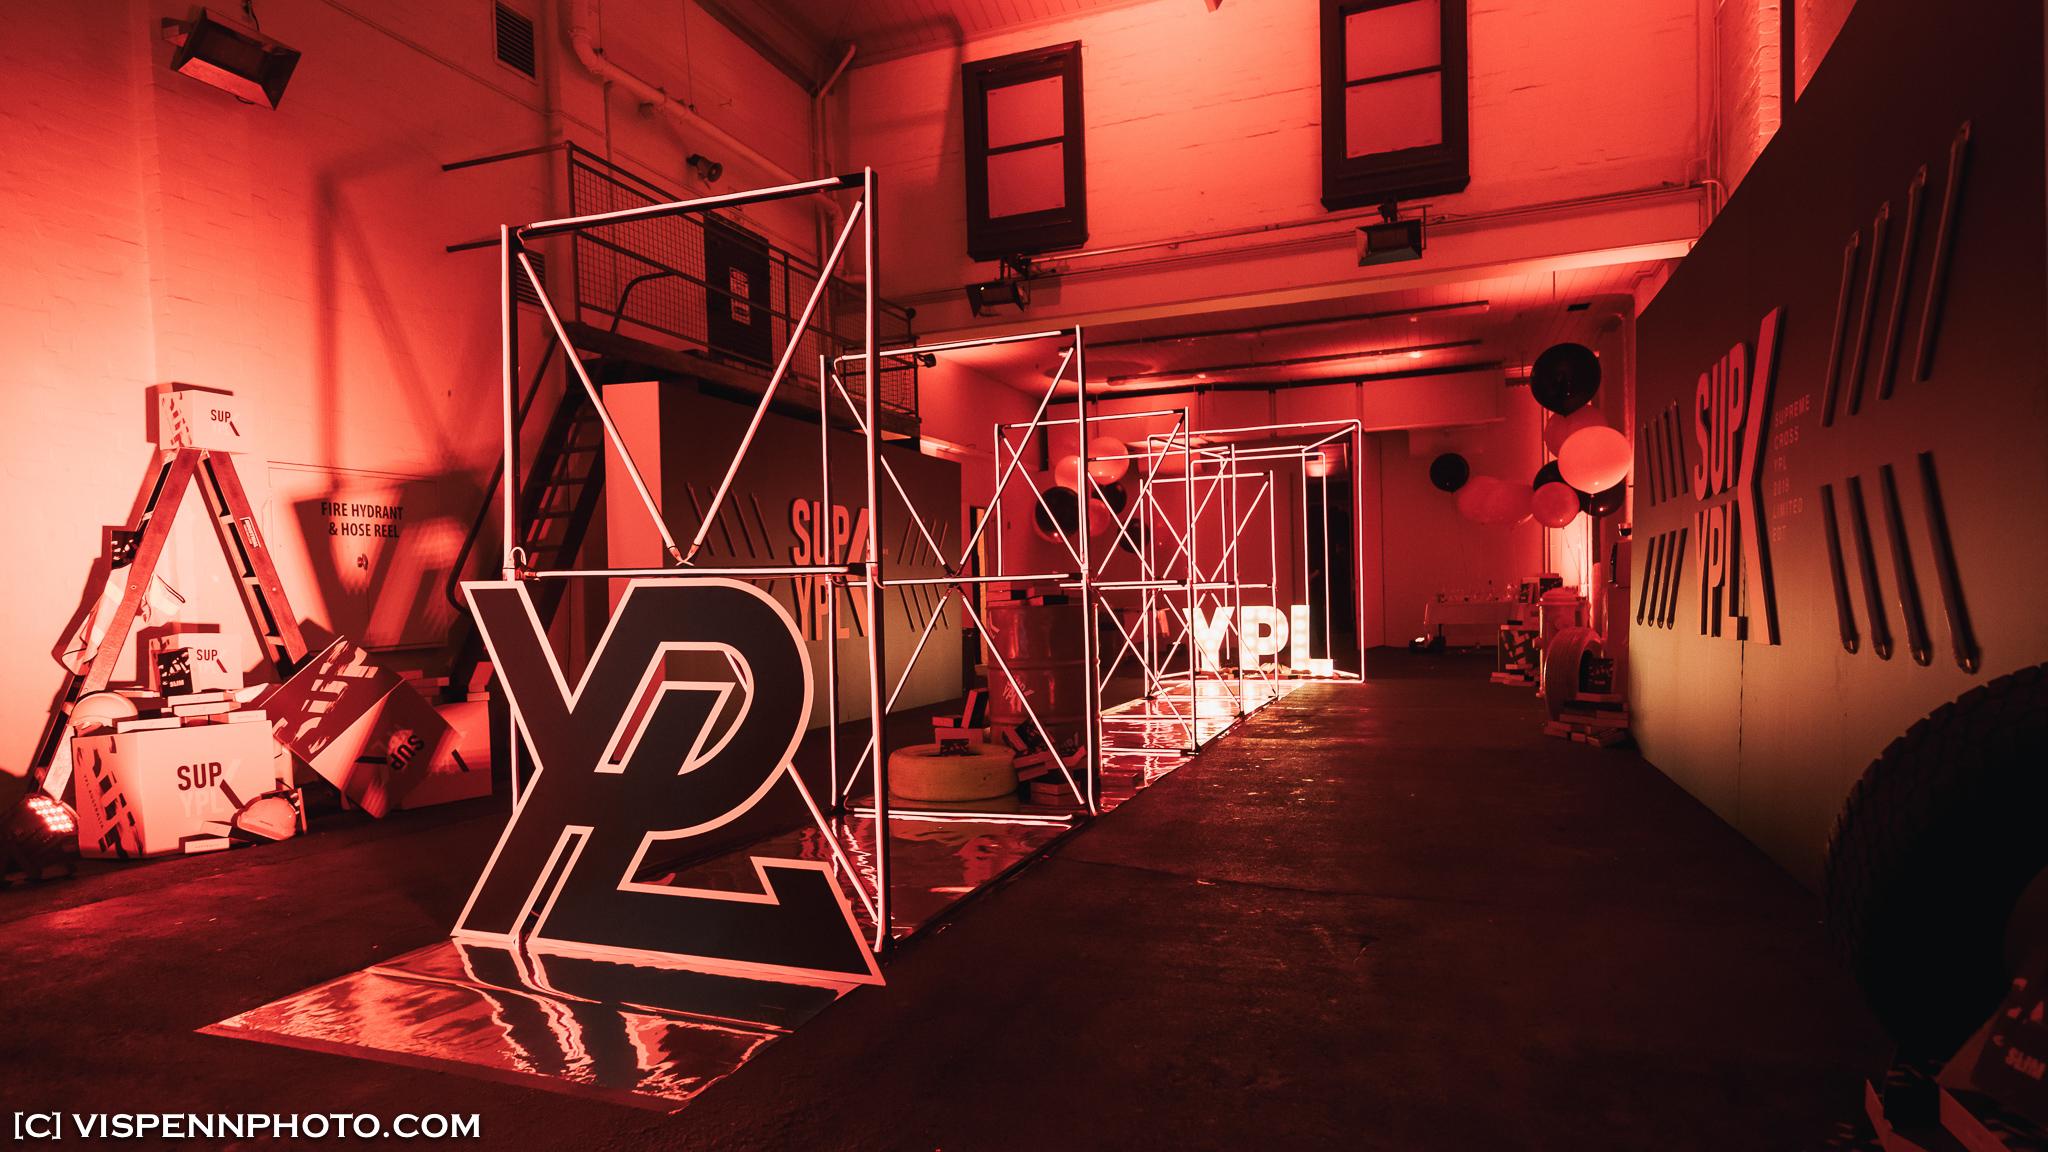 Melbourne Events Photography VISPENN 墨尔本 活动摄影 年会拍摄 YPL 1178 P5D4 VISPENN